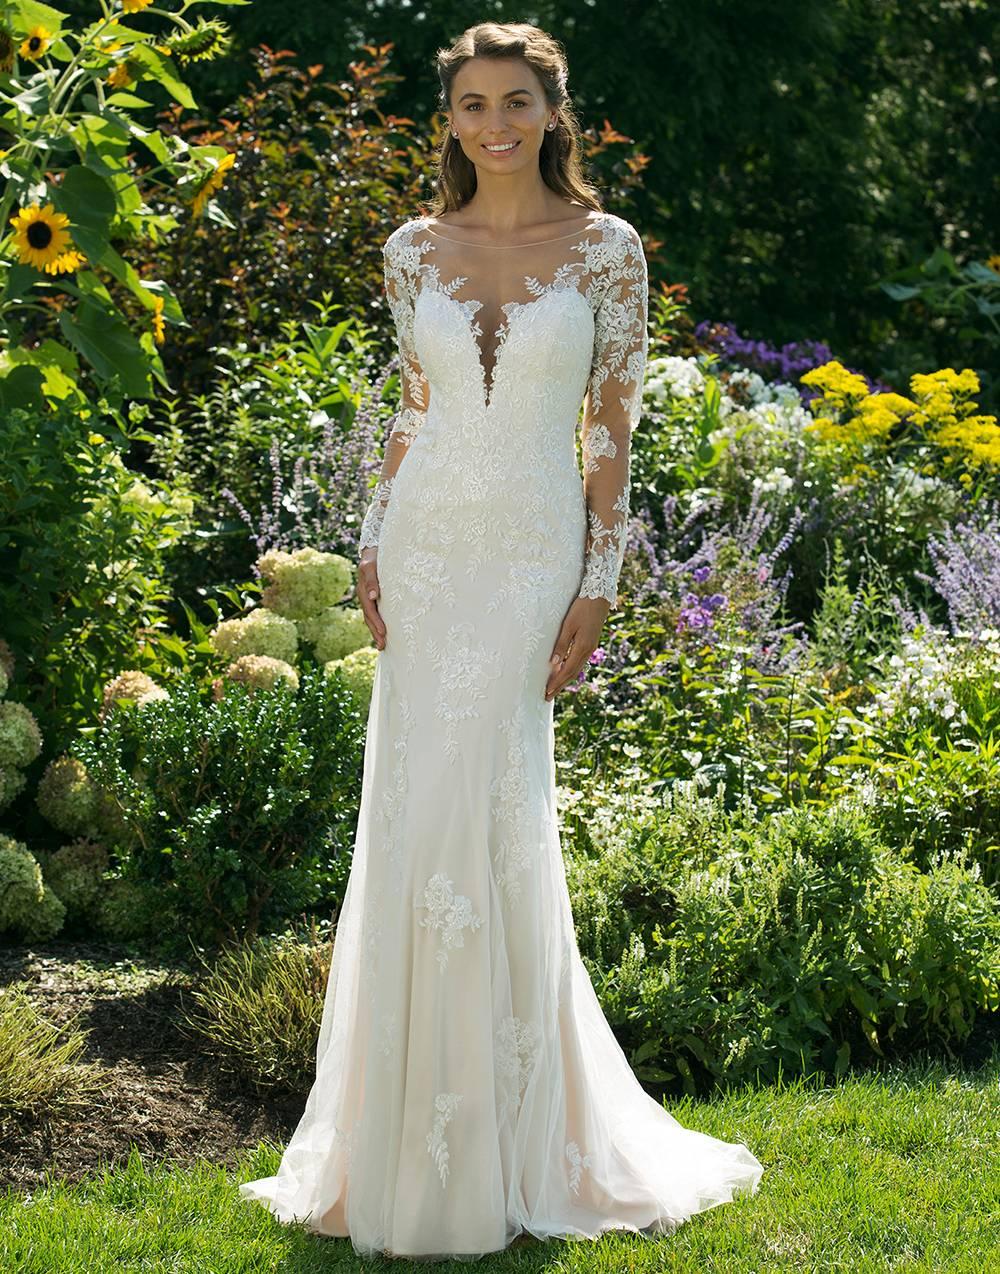 Breathless Bridal - clothing store    Photo 2 of 6   Address: 1741 US-41, Ridgetop, TN 37152, USA   Phone: (615) 855-0644